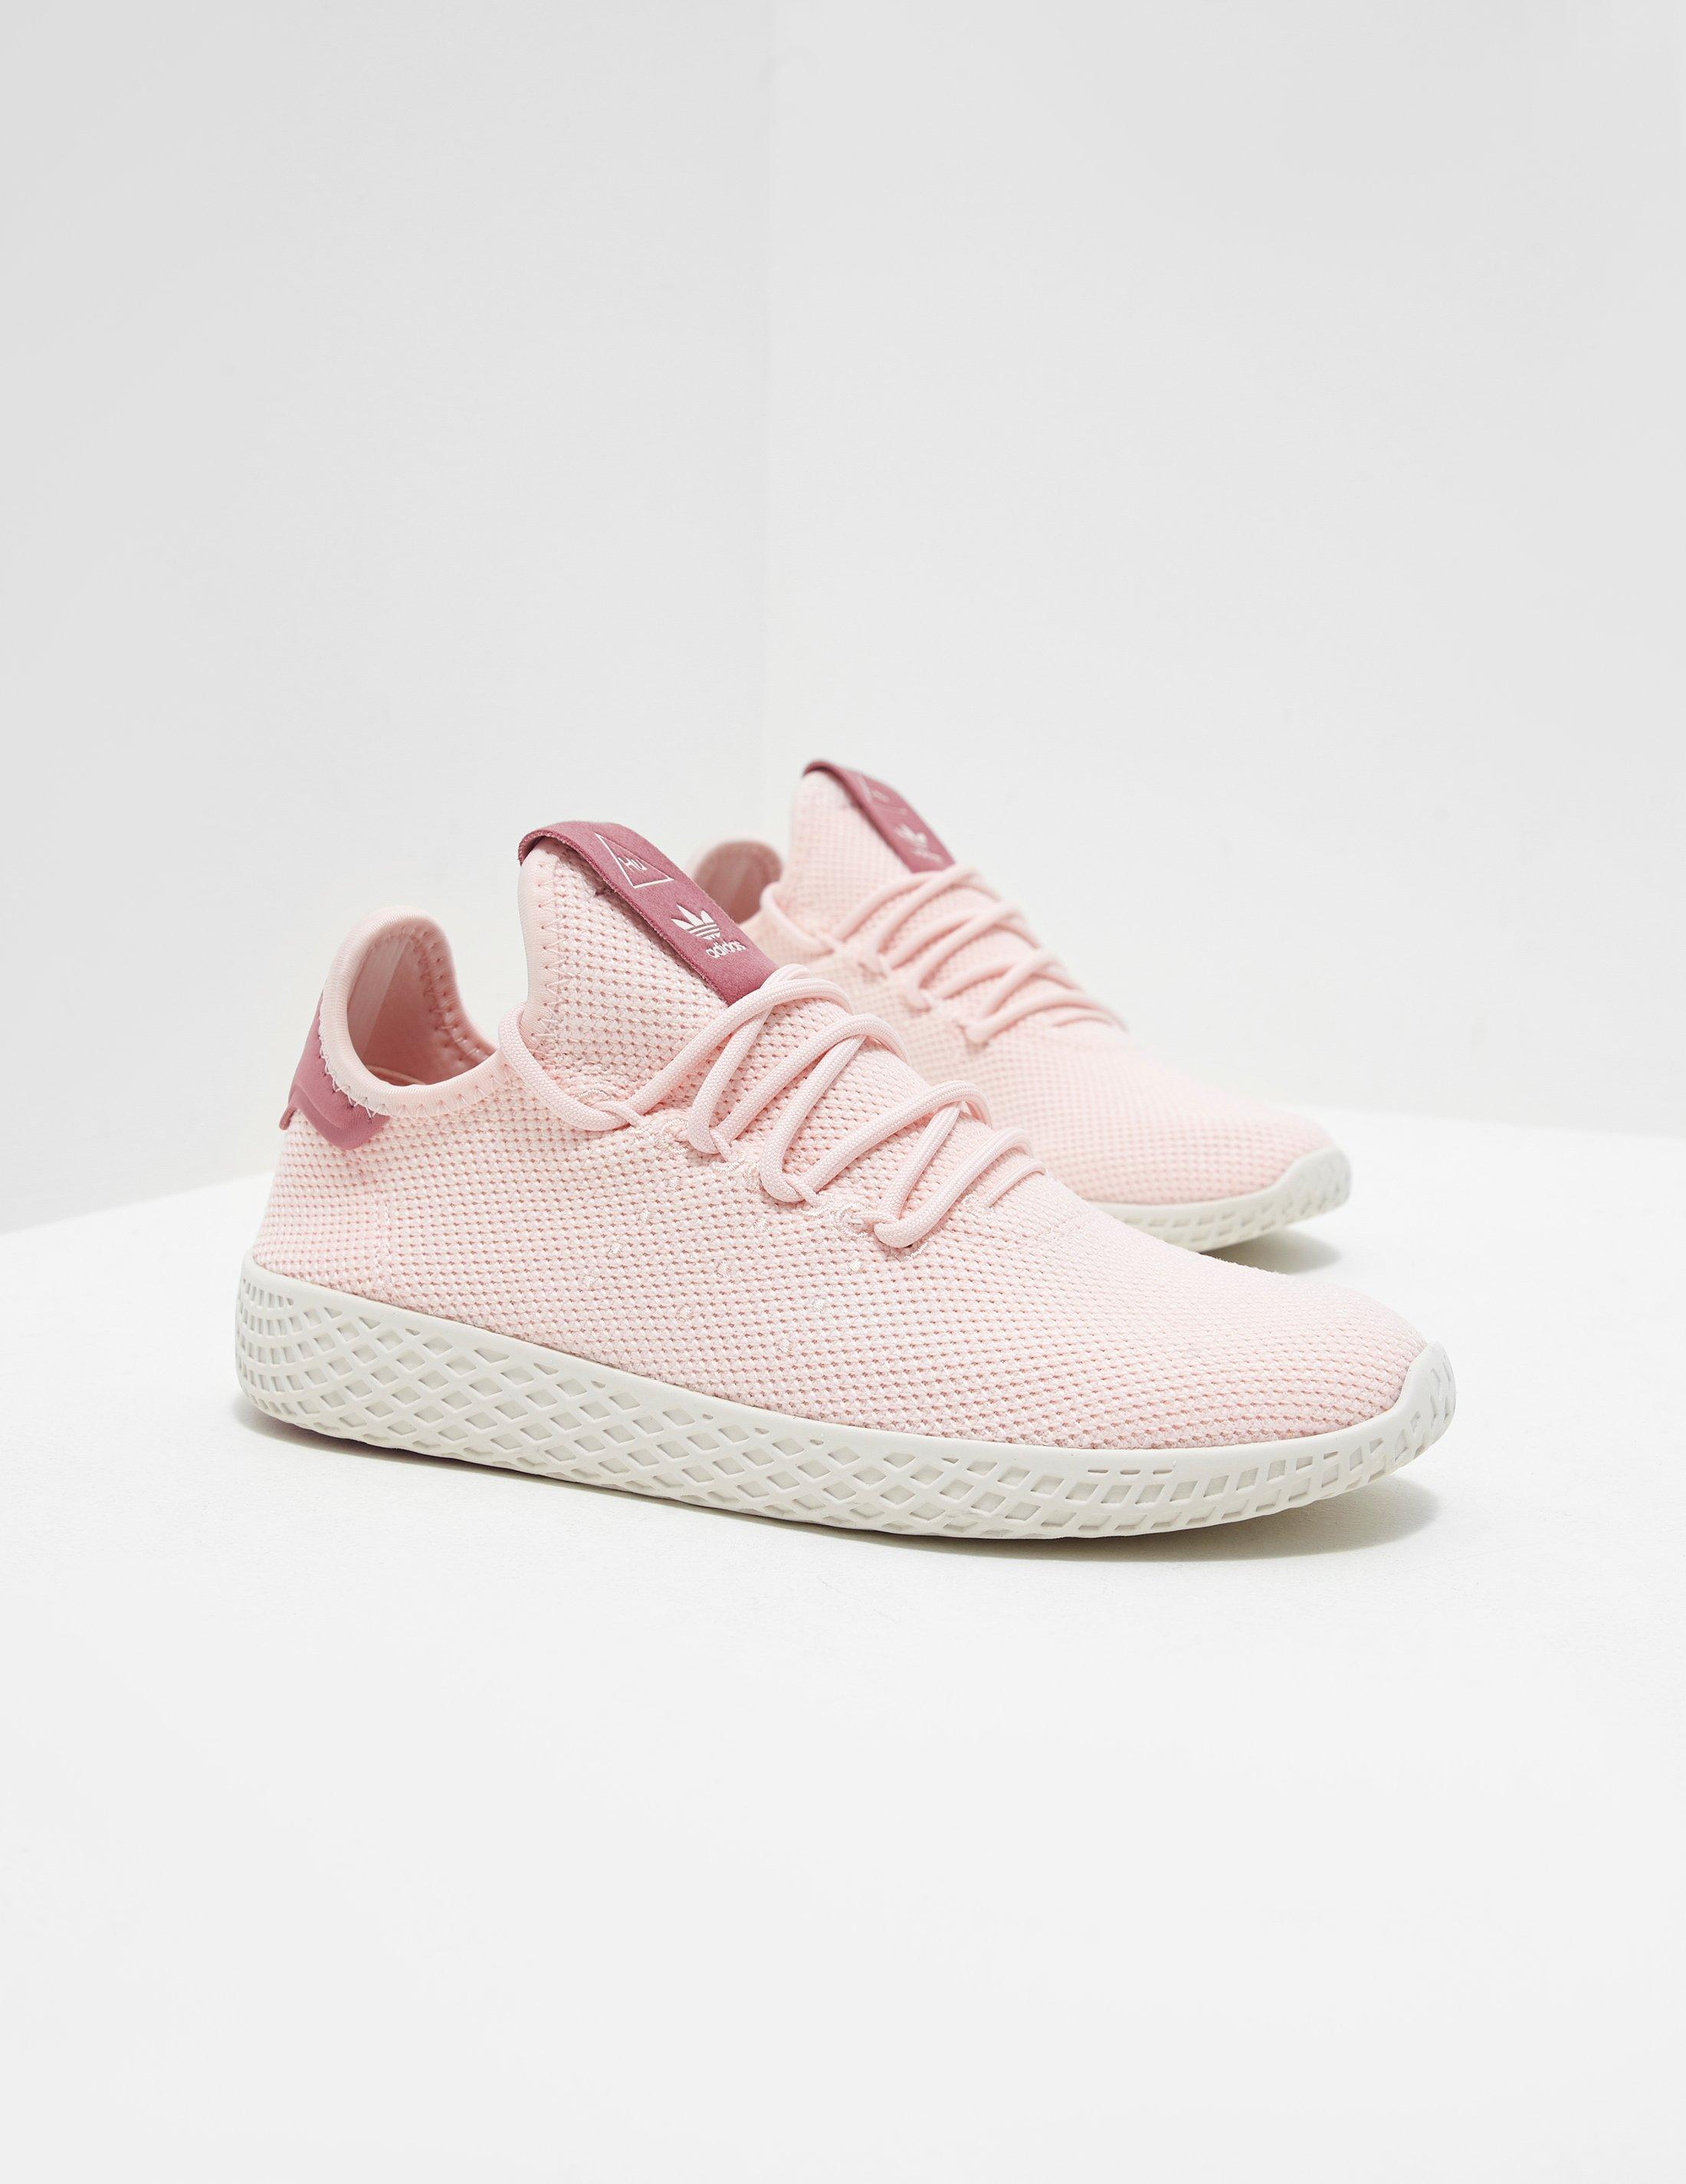 7de0c104f5591 adidas Originals X Pharrell Williams Tennis Hu Trainers Pink in Pink ...